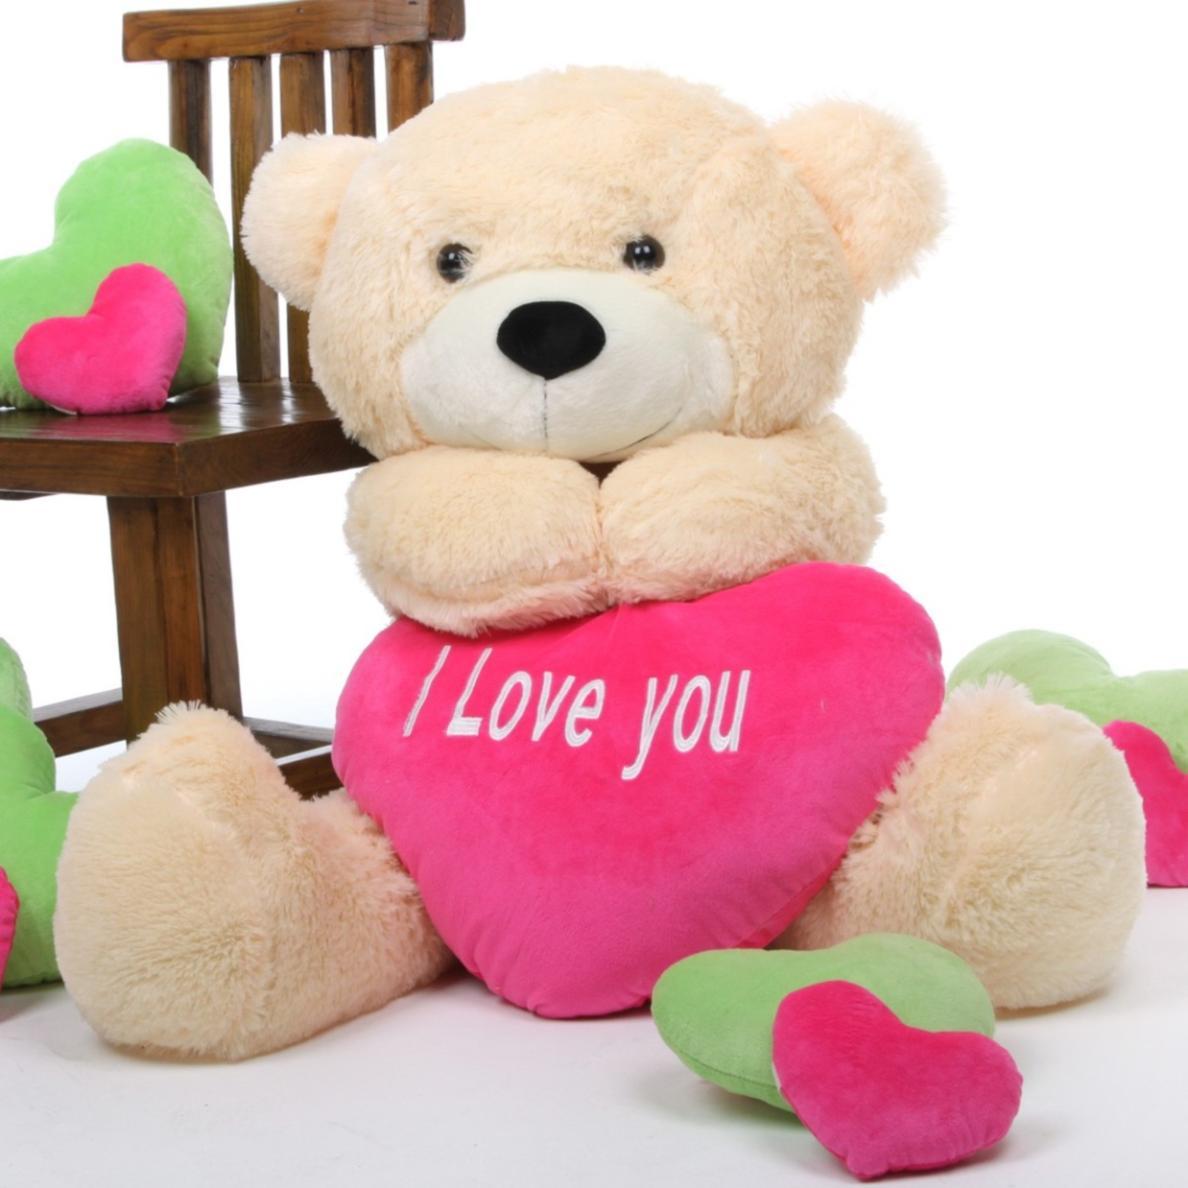 Best Wallpaper Love Teddy Bear - Images-of-Teddy-Bears-5  Collection_40774.jpg